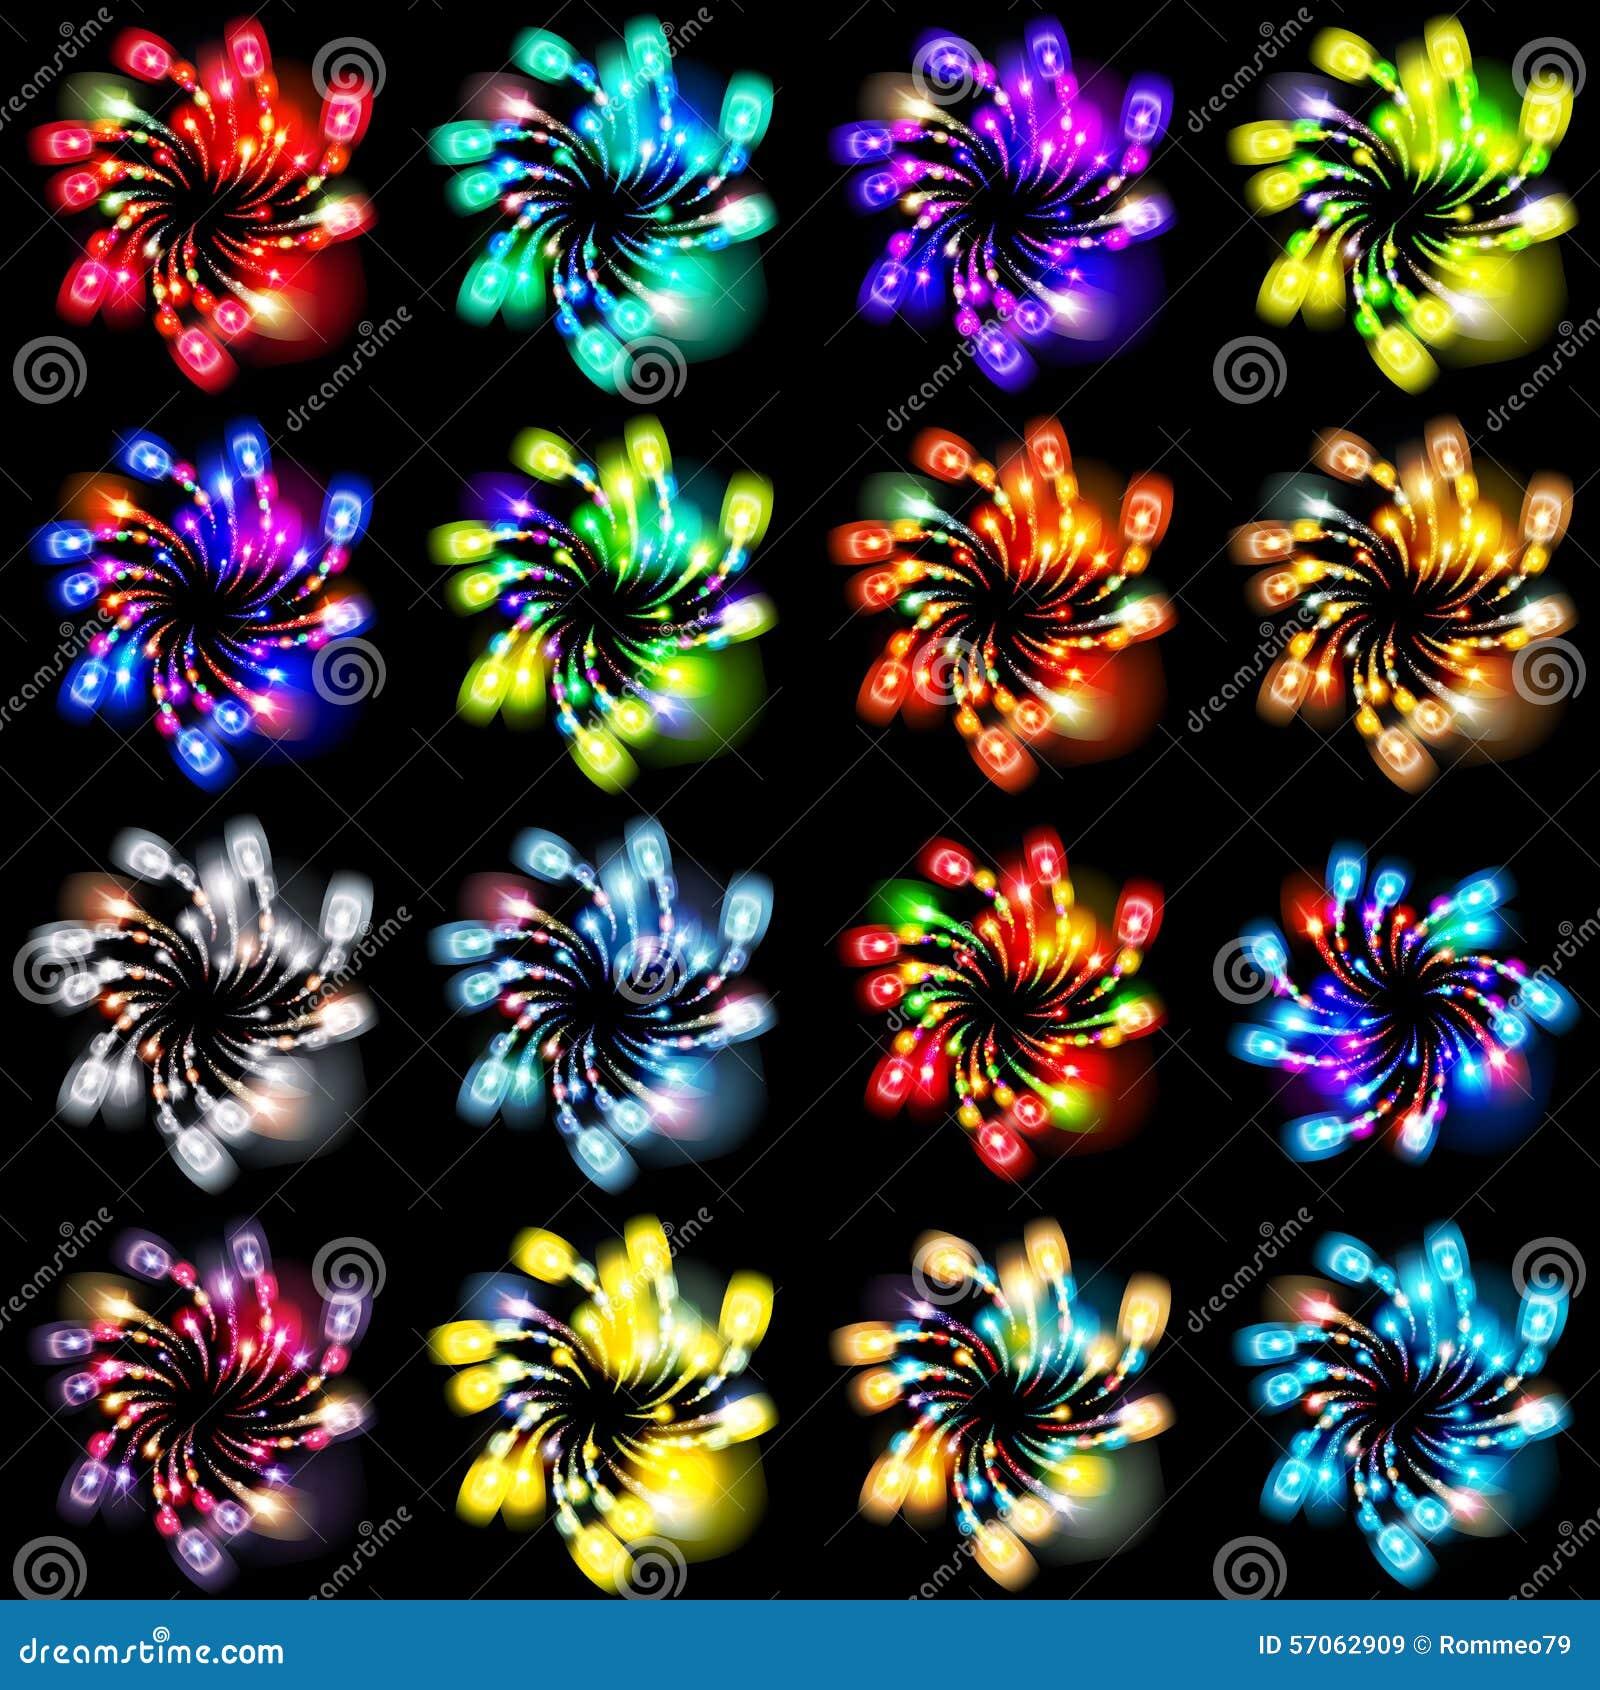 Feestelijk gevormd vuurwerk die in diverse vormen fonkelende pictogrammen barsten